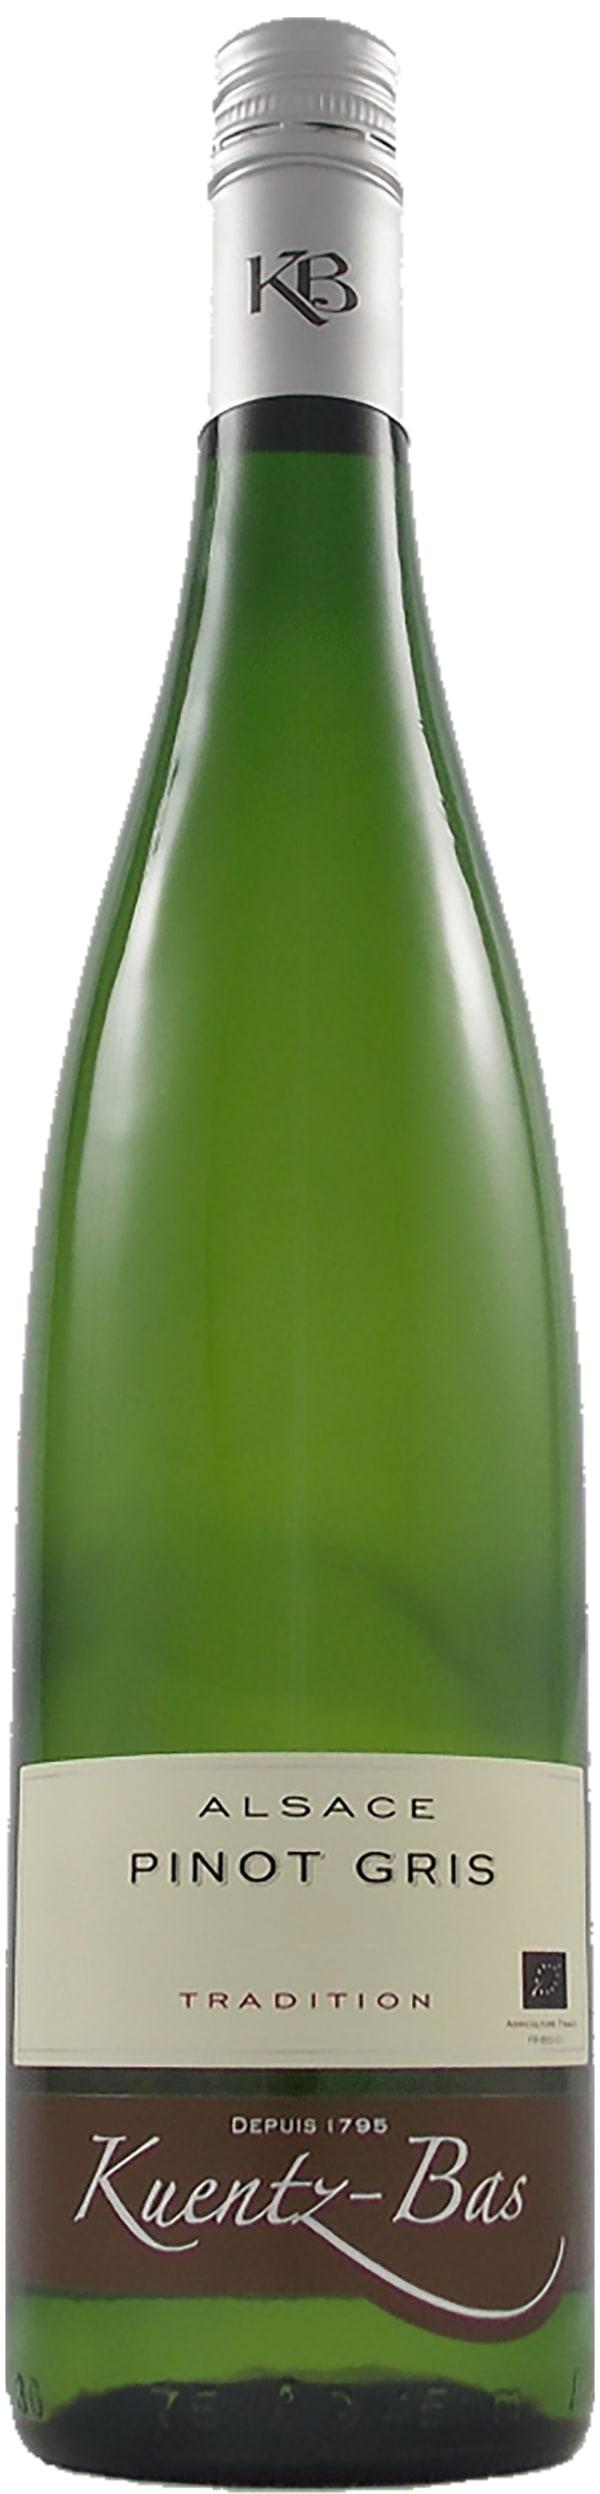 Kuentz-Bas Pinot Gris  2013